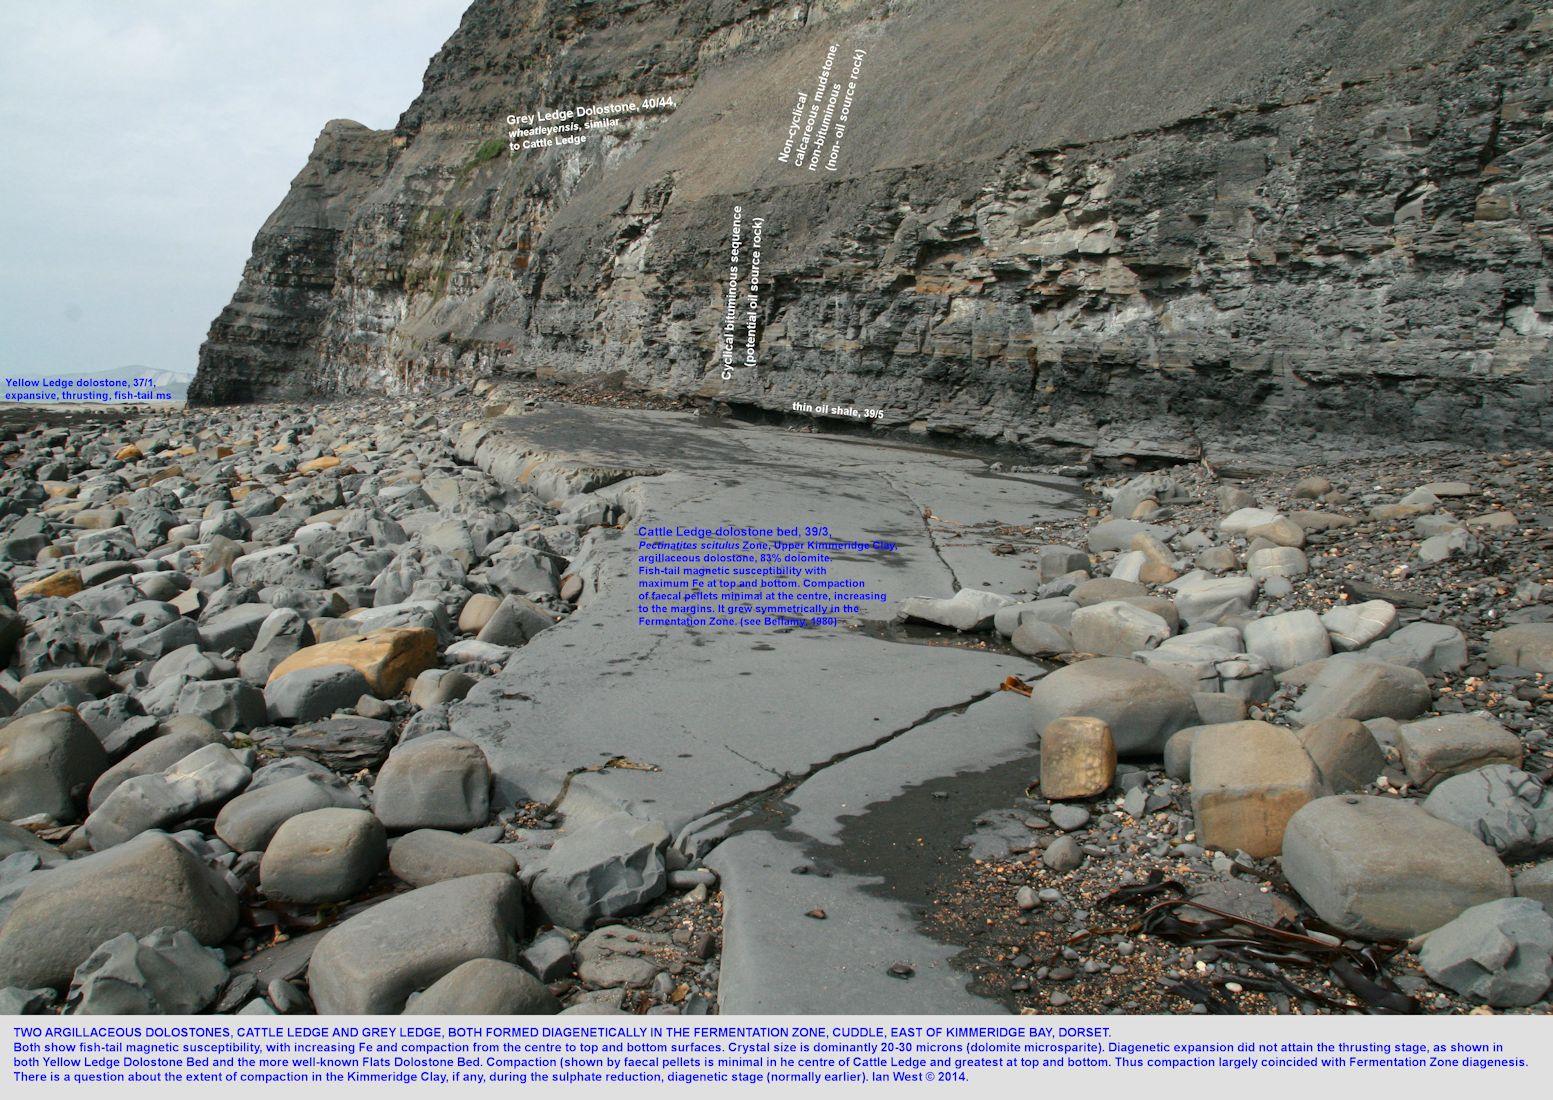 Fermentation diagenesis, ferroan dolostones (dolomites), Cattle Ledge and Grey Ledge Stone Bands, Upper Kimmeridge Clay, Cuddle, east of Kimmeridge Bay, Dorset, 31st March 2014